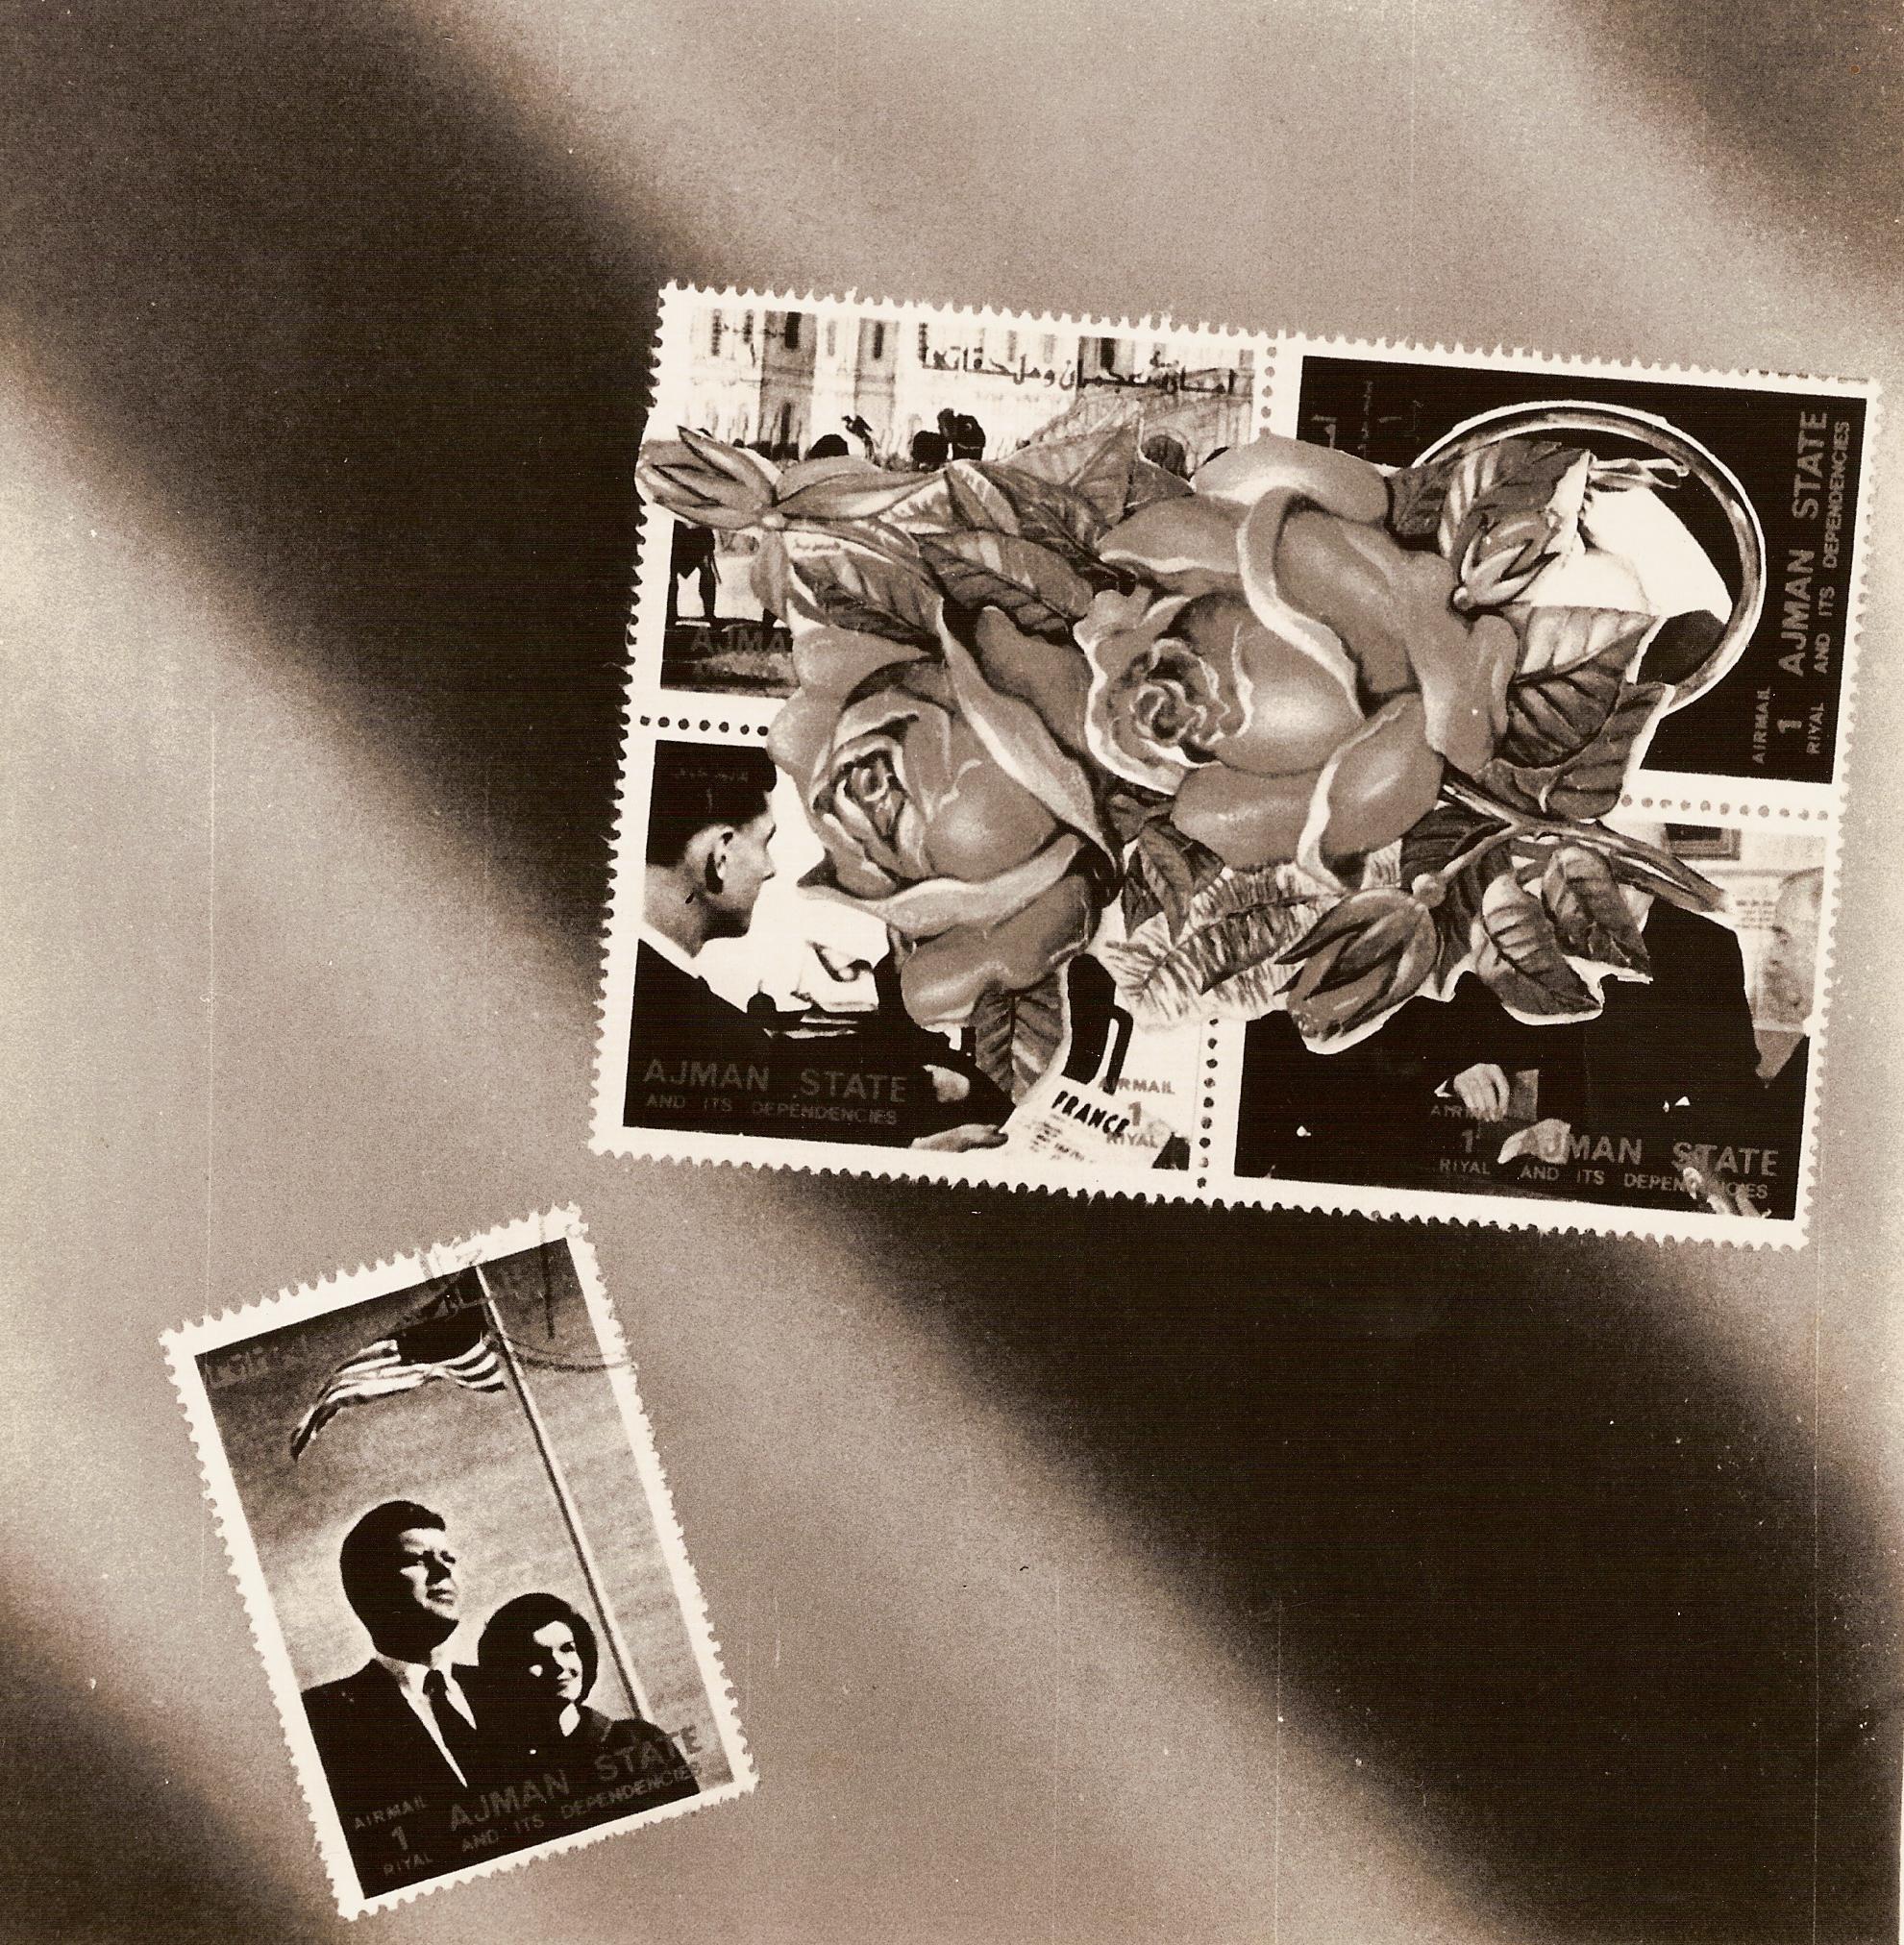 La era Kennedy,  papel collage, 15 cm x 15 cm, 1999